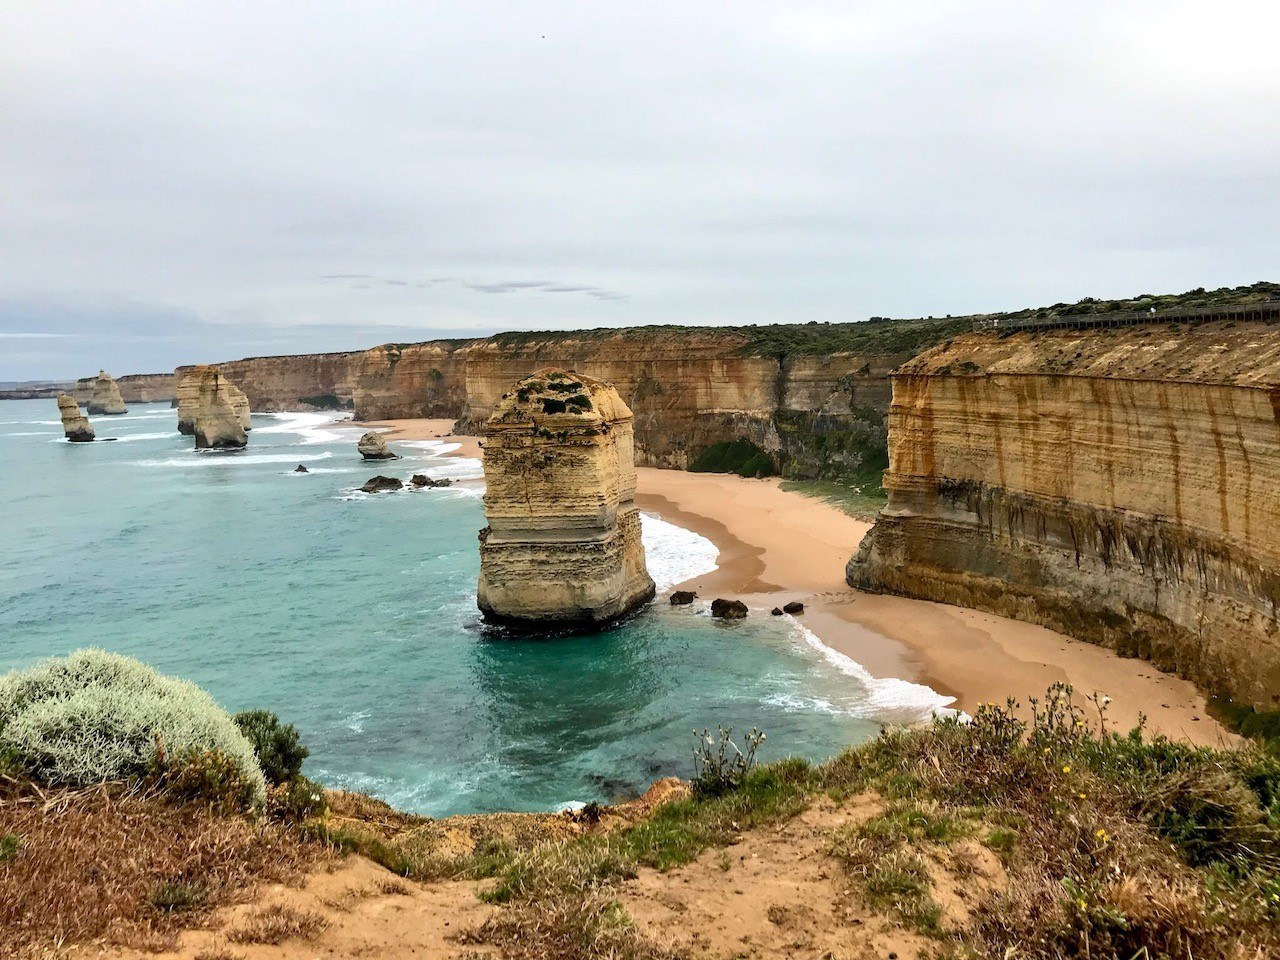 Our Great Ocean Road Tour – Wildlife & Raging Coastlines